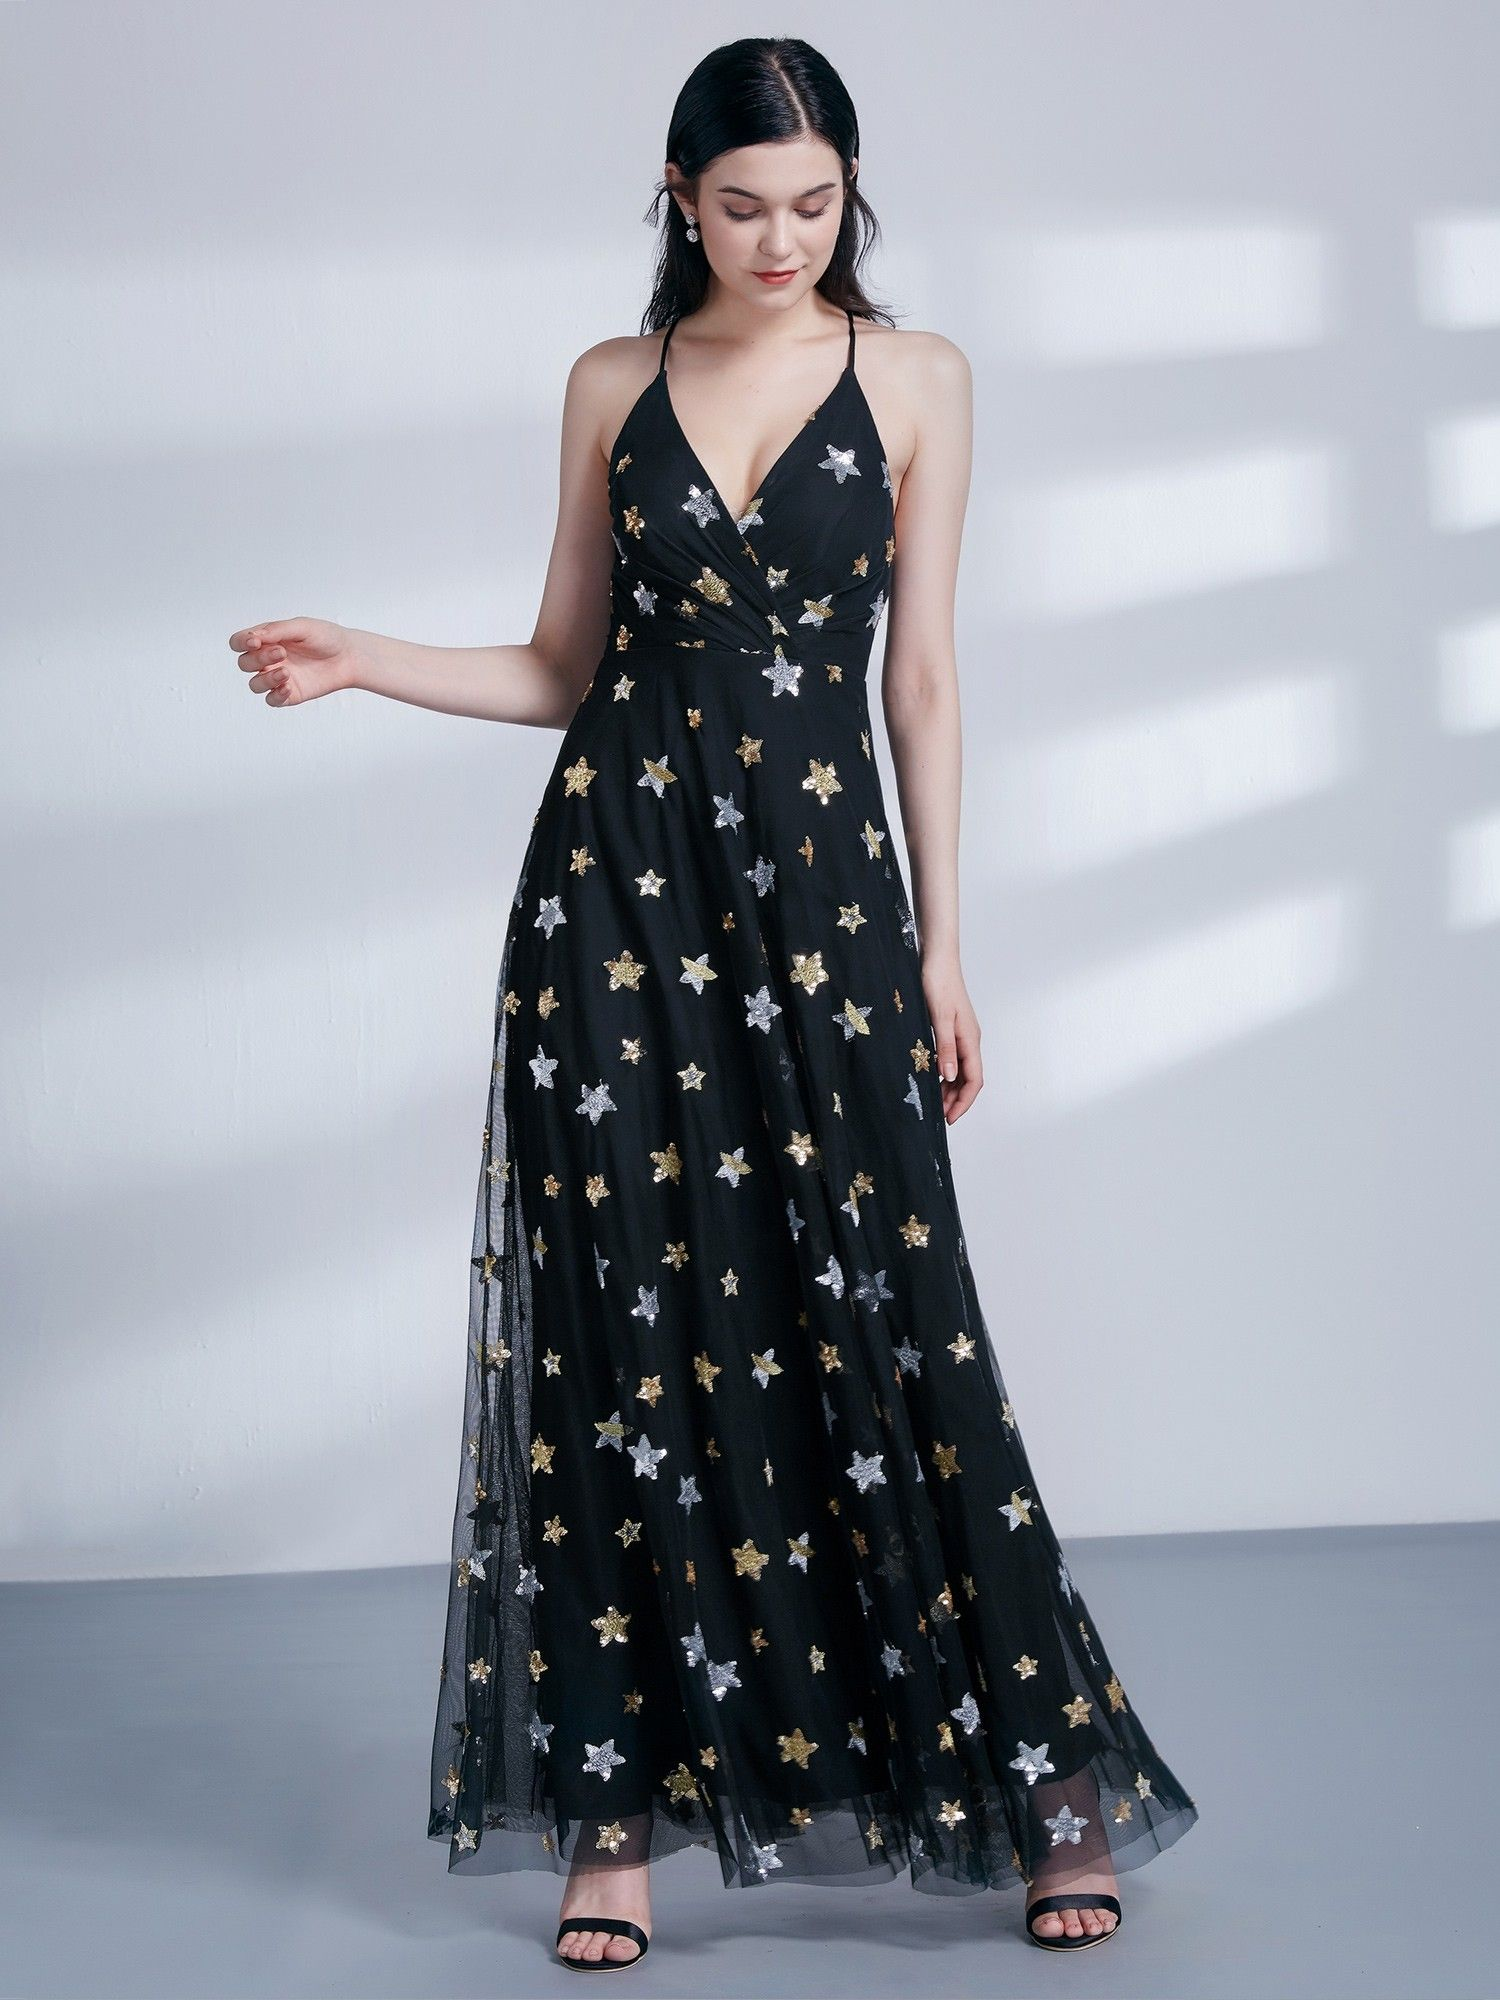 Star Print V Neck Party Dress